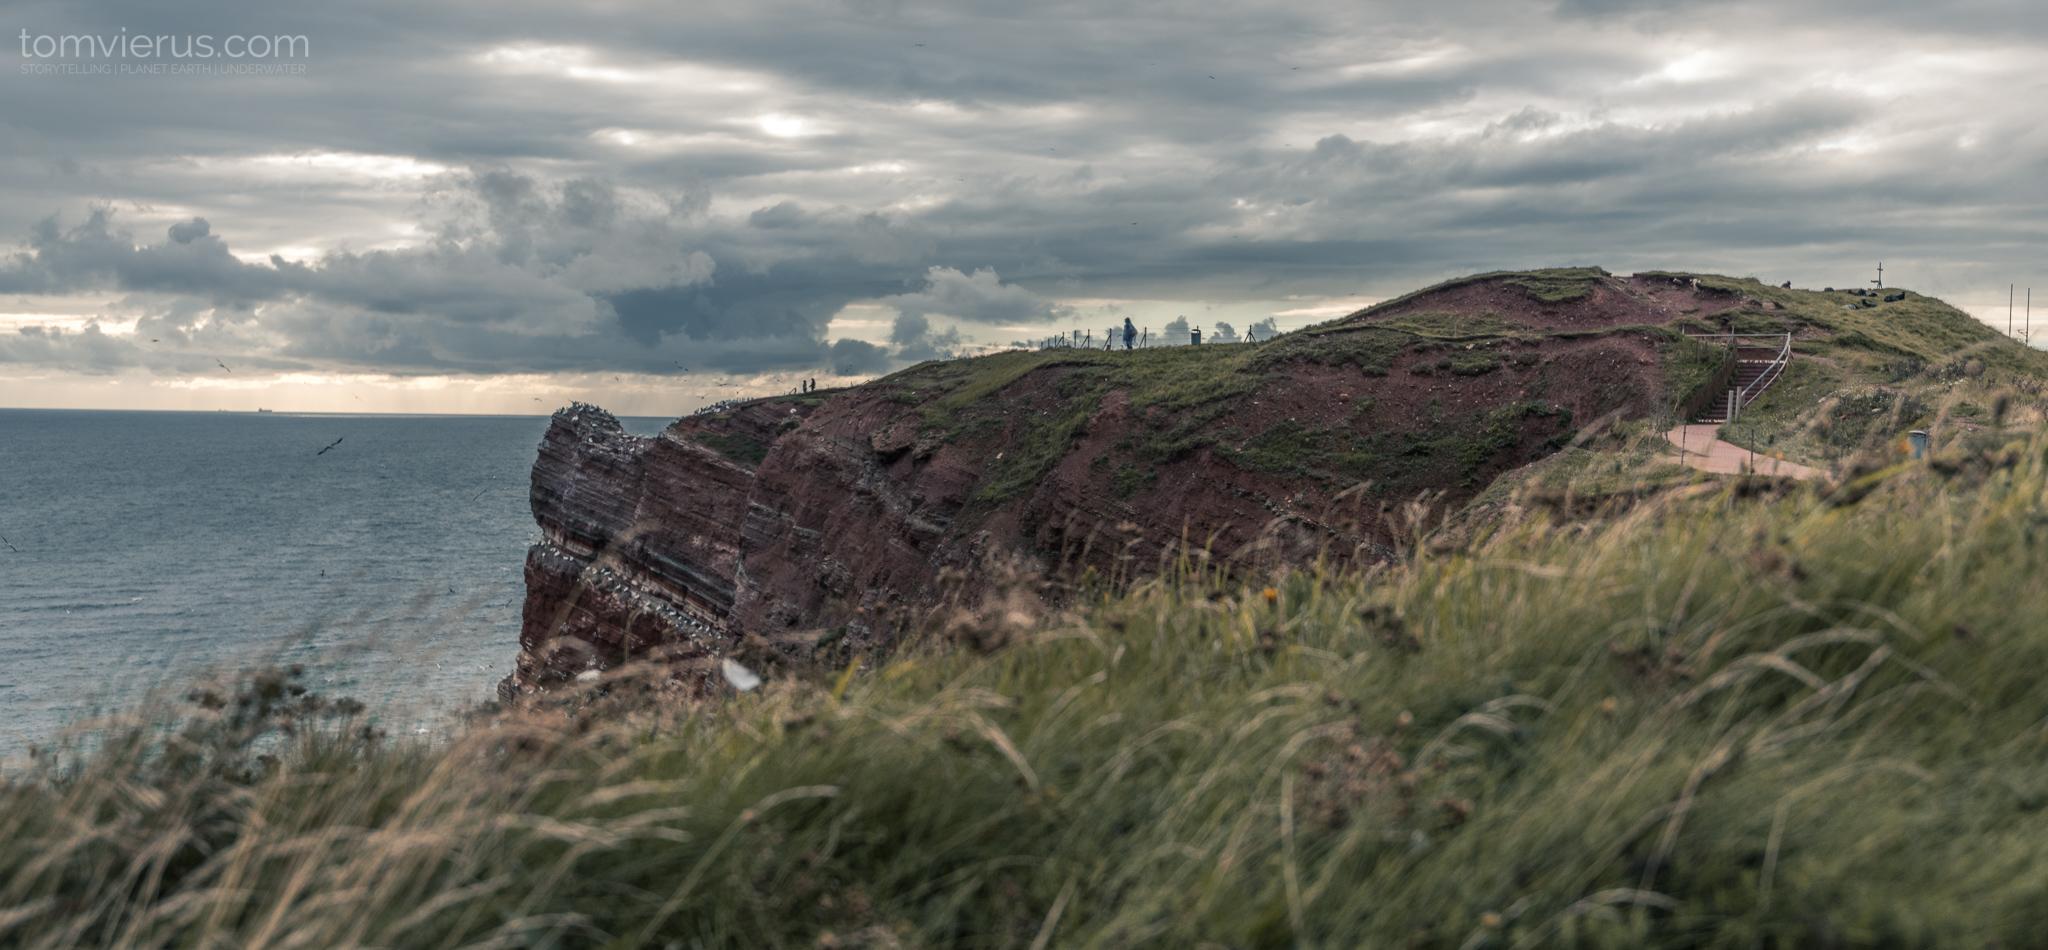 Helgoland, seabirds, cliffs